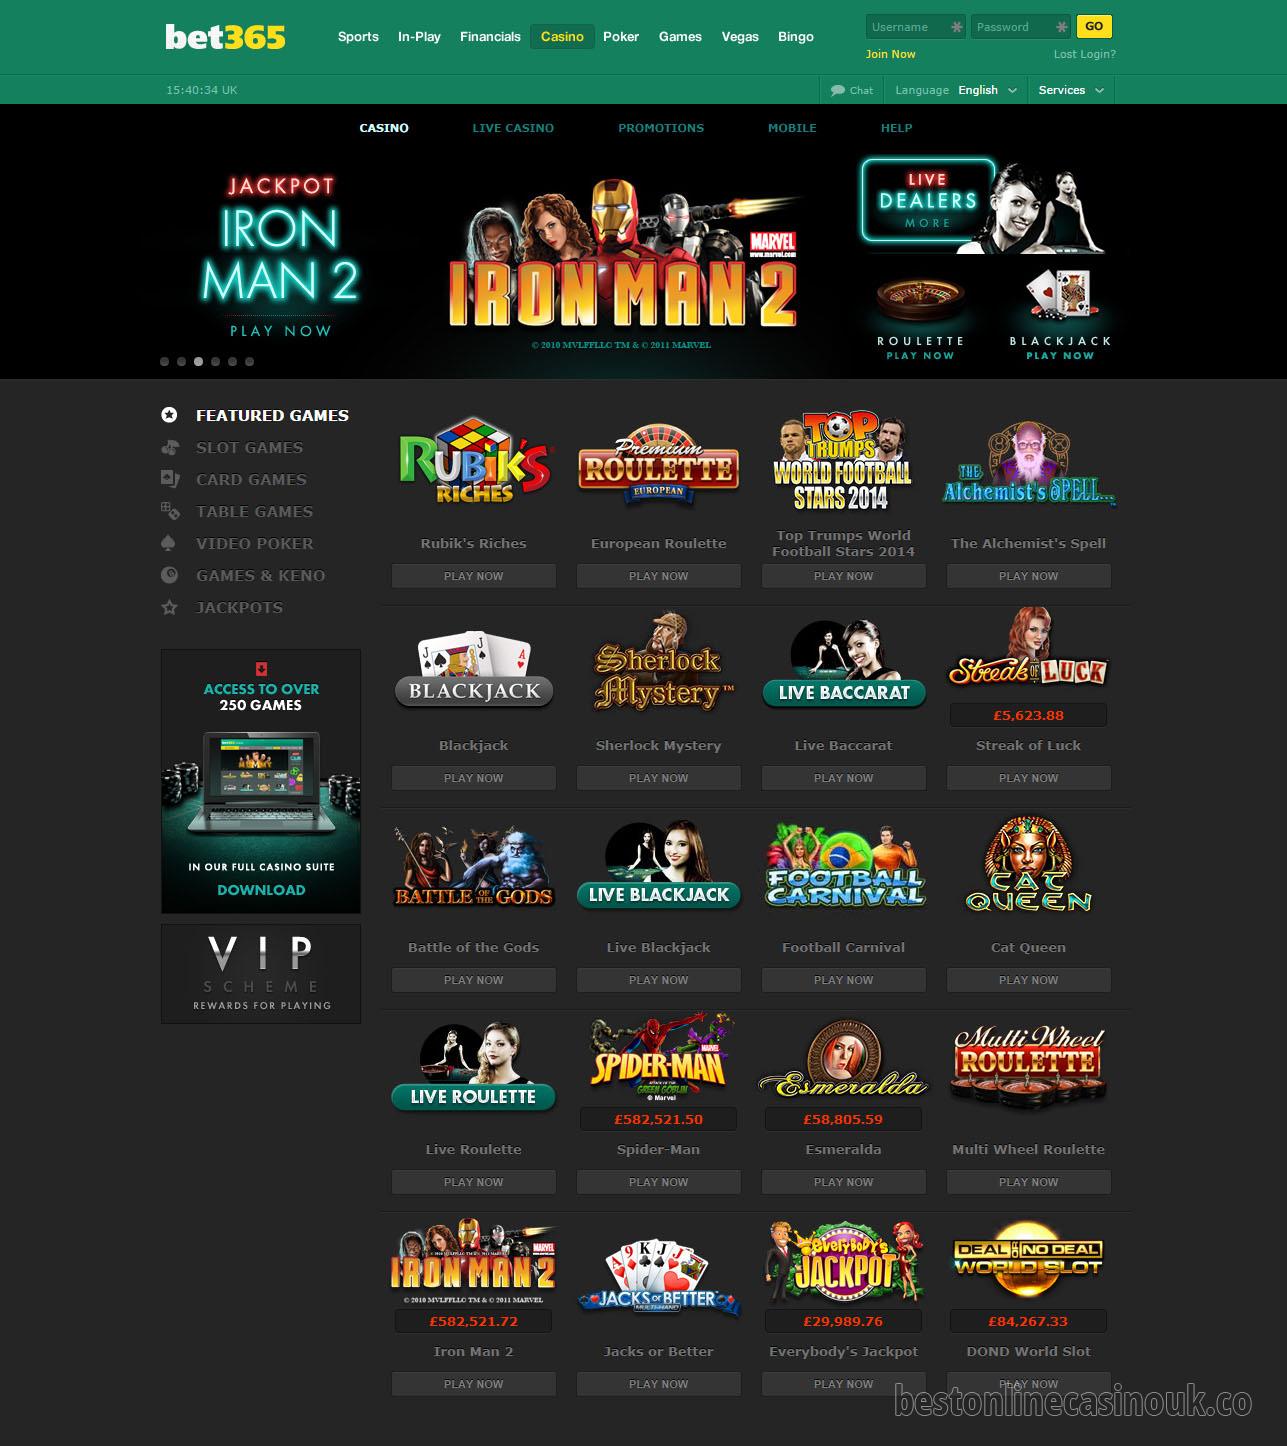 365 - sports betting casino poker games vegas bingo tournoi de poker dijon 2017